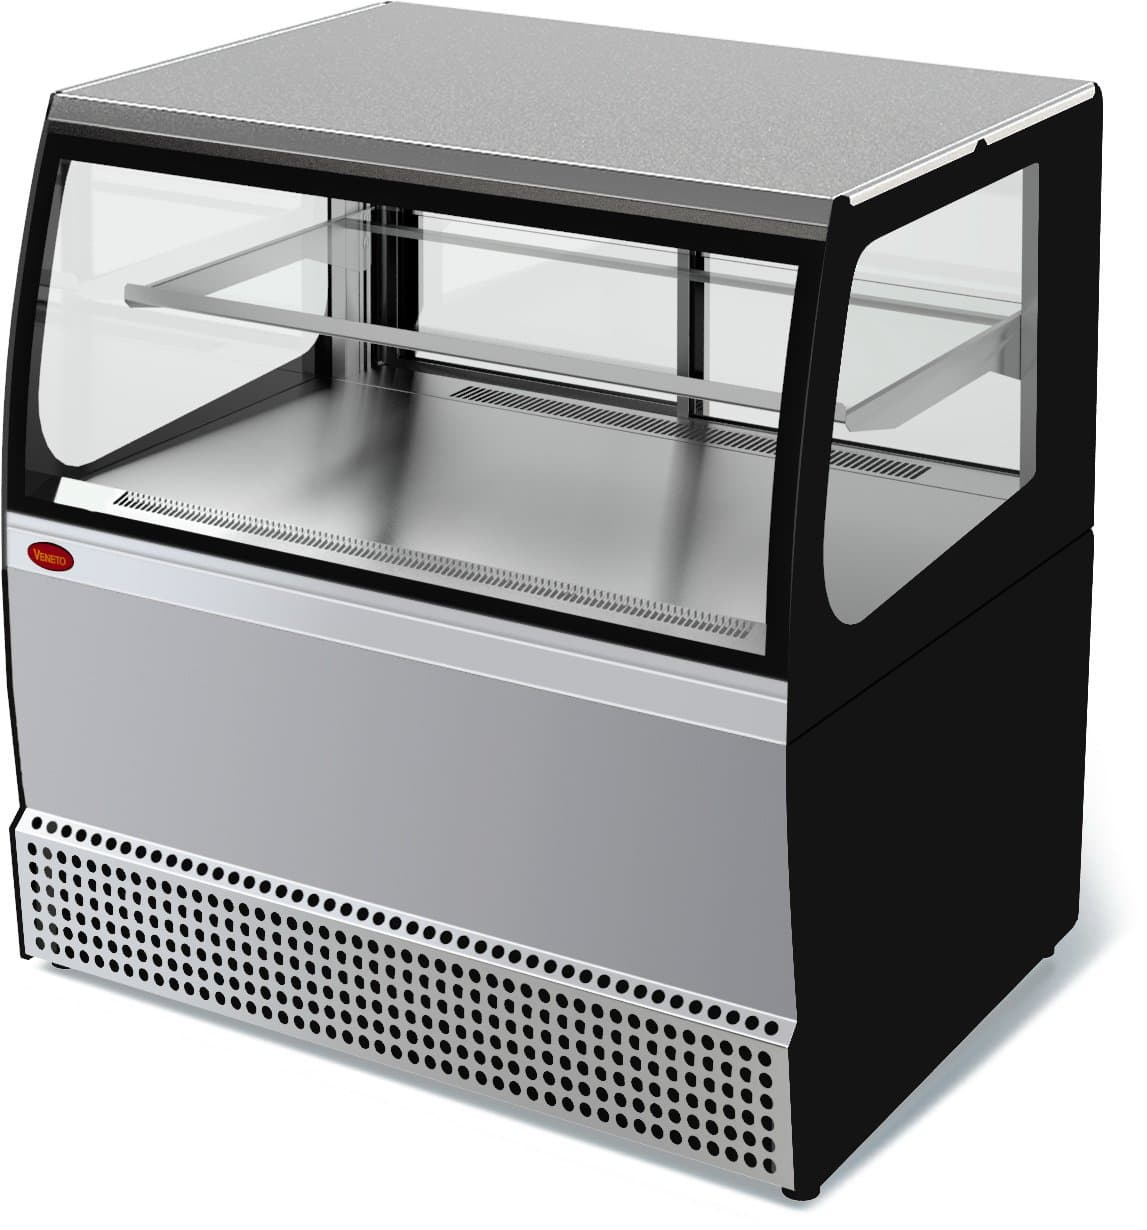 Витрина холодильная Veneto VSk-0,95 (нерж.)